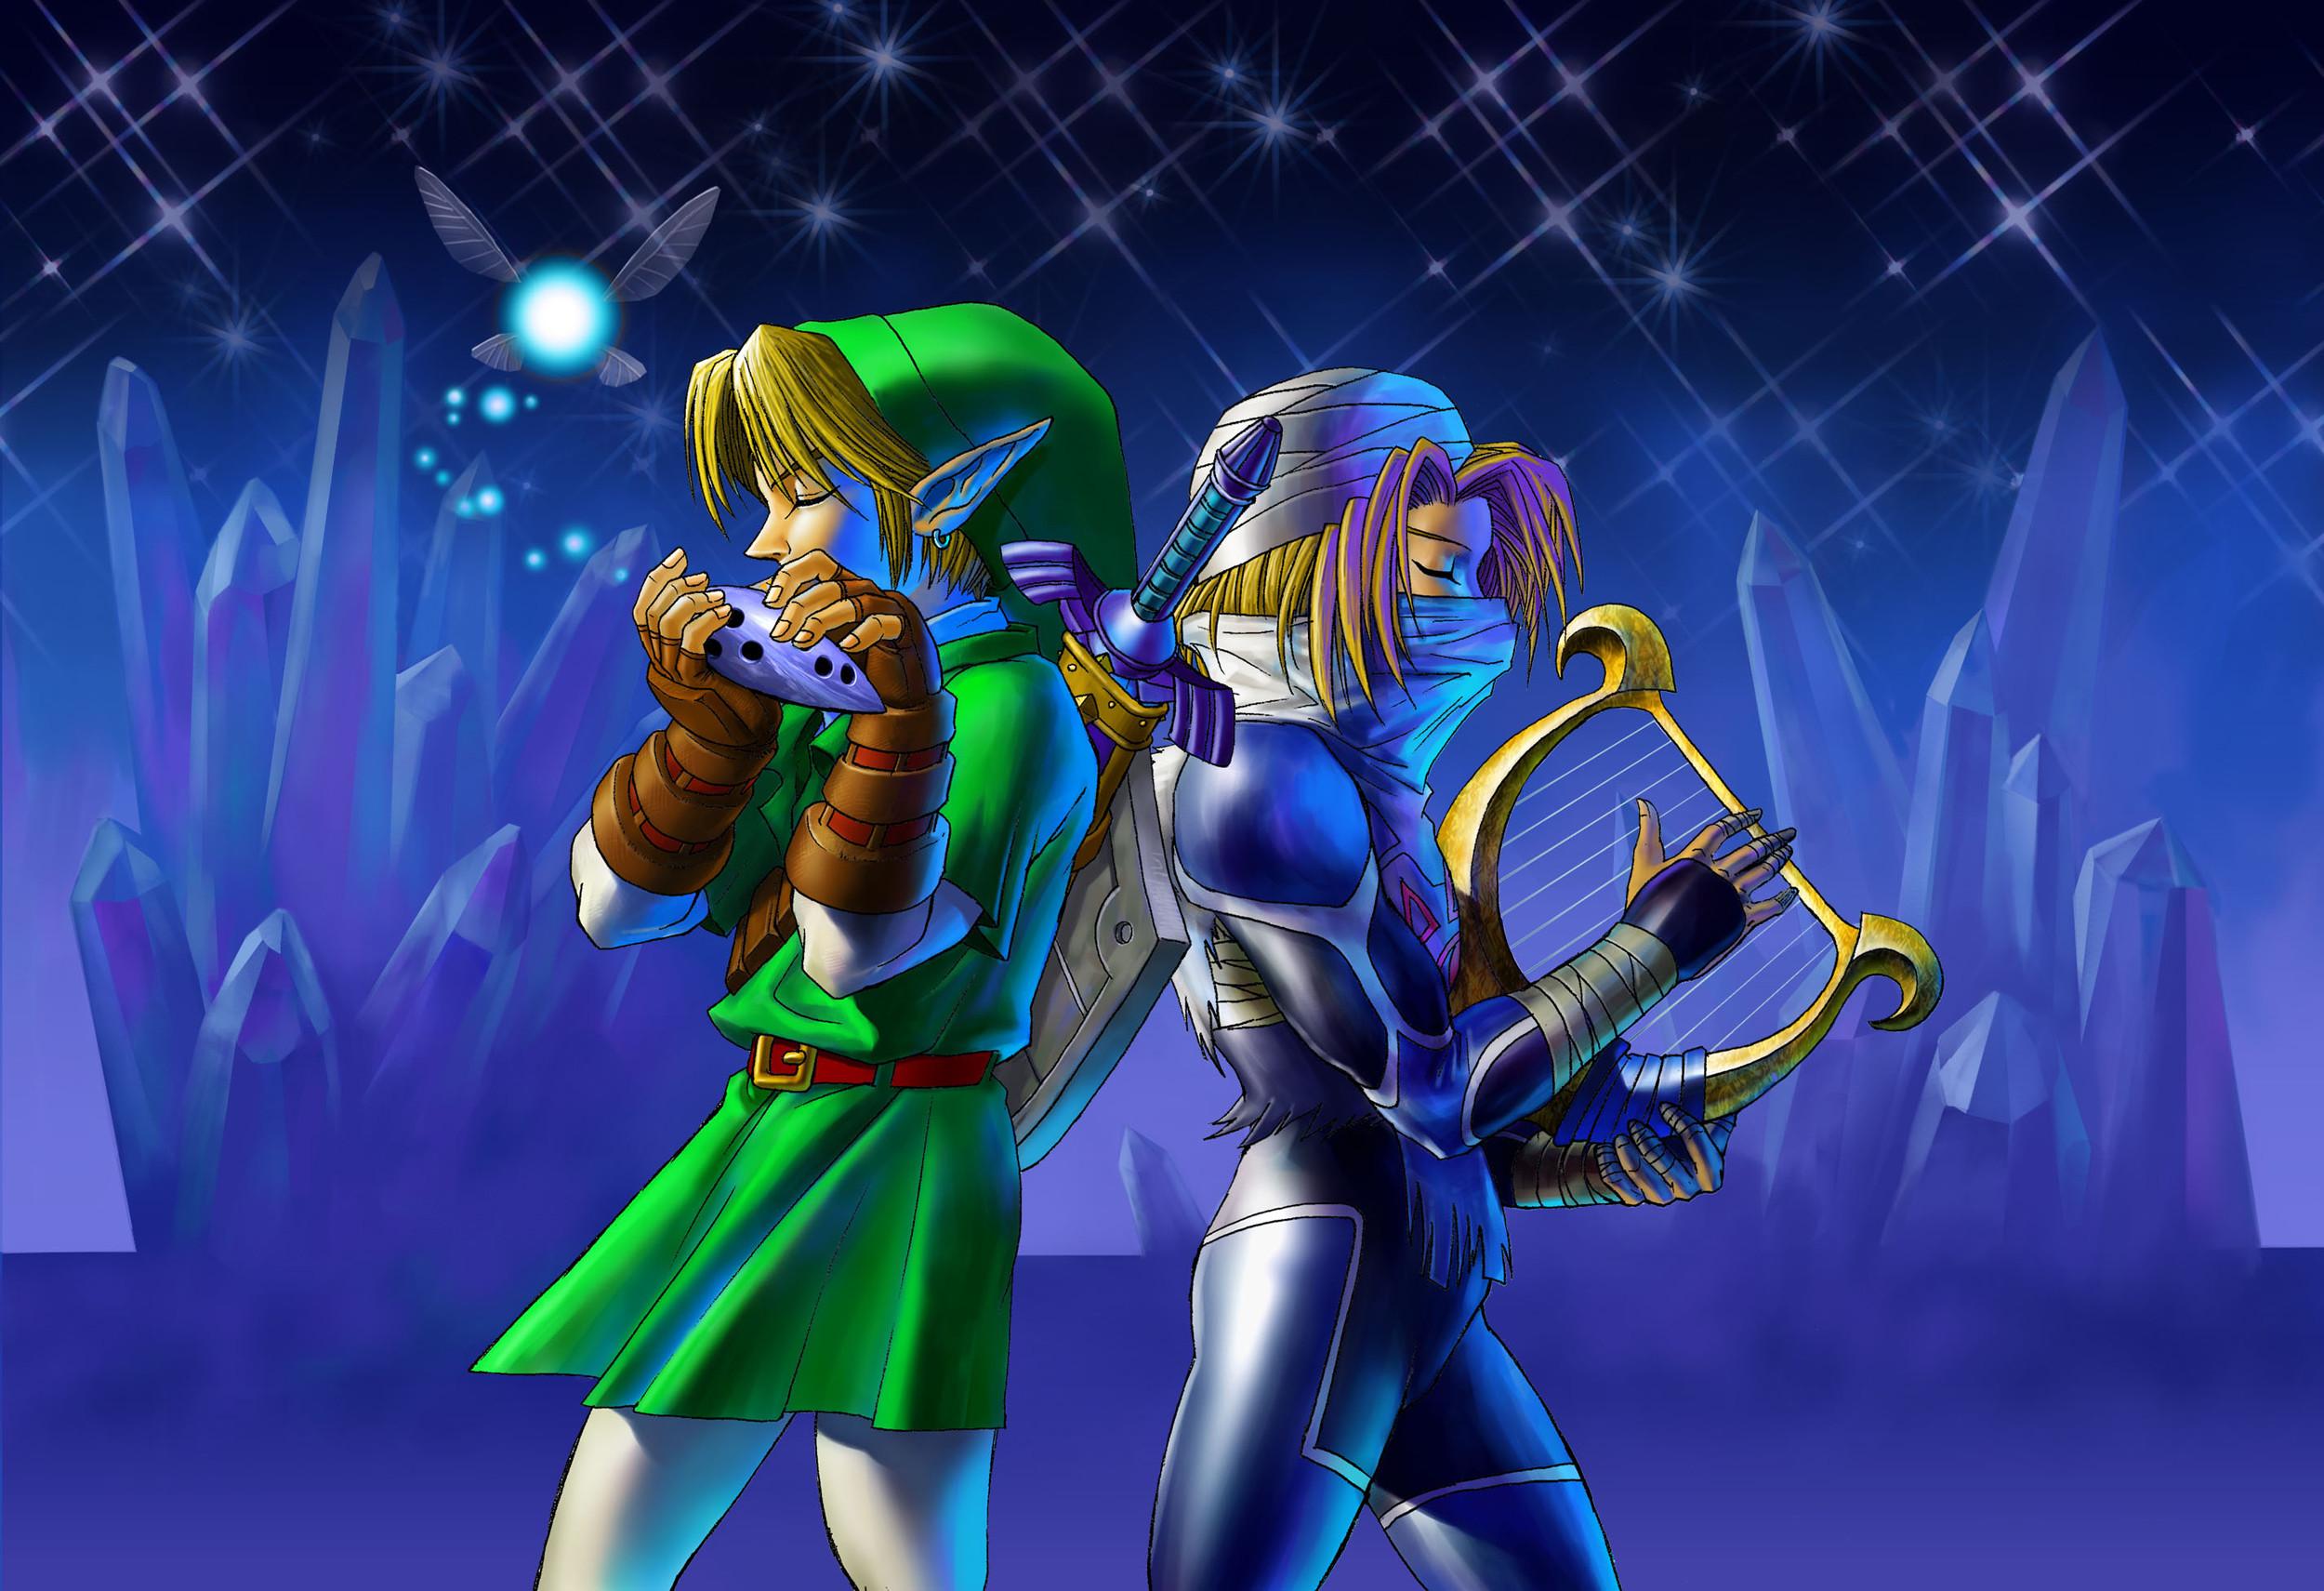 Legend Of Zelda Ocarina Of Time Wallpapers High Definition